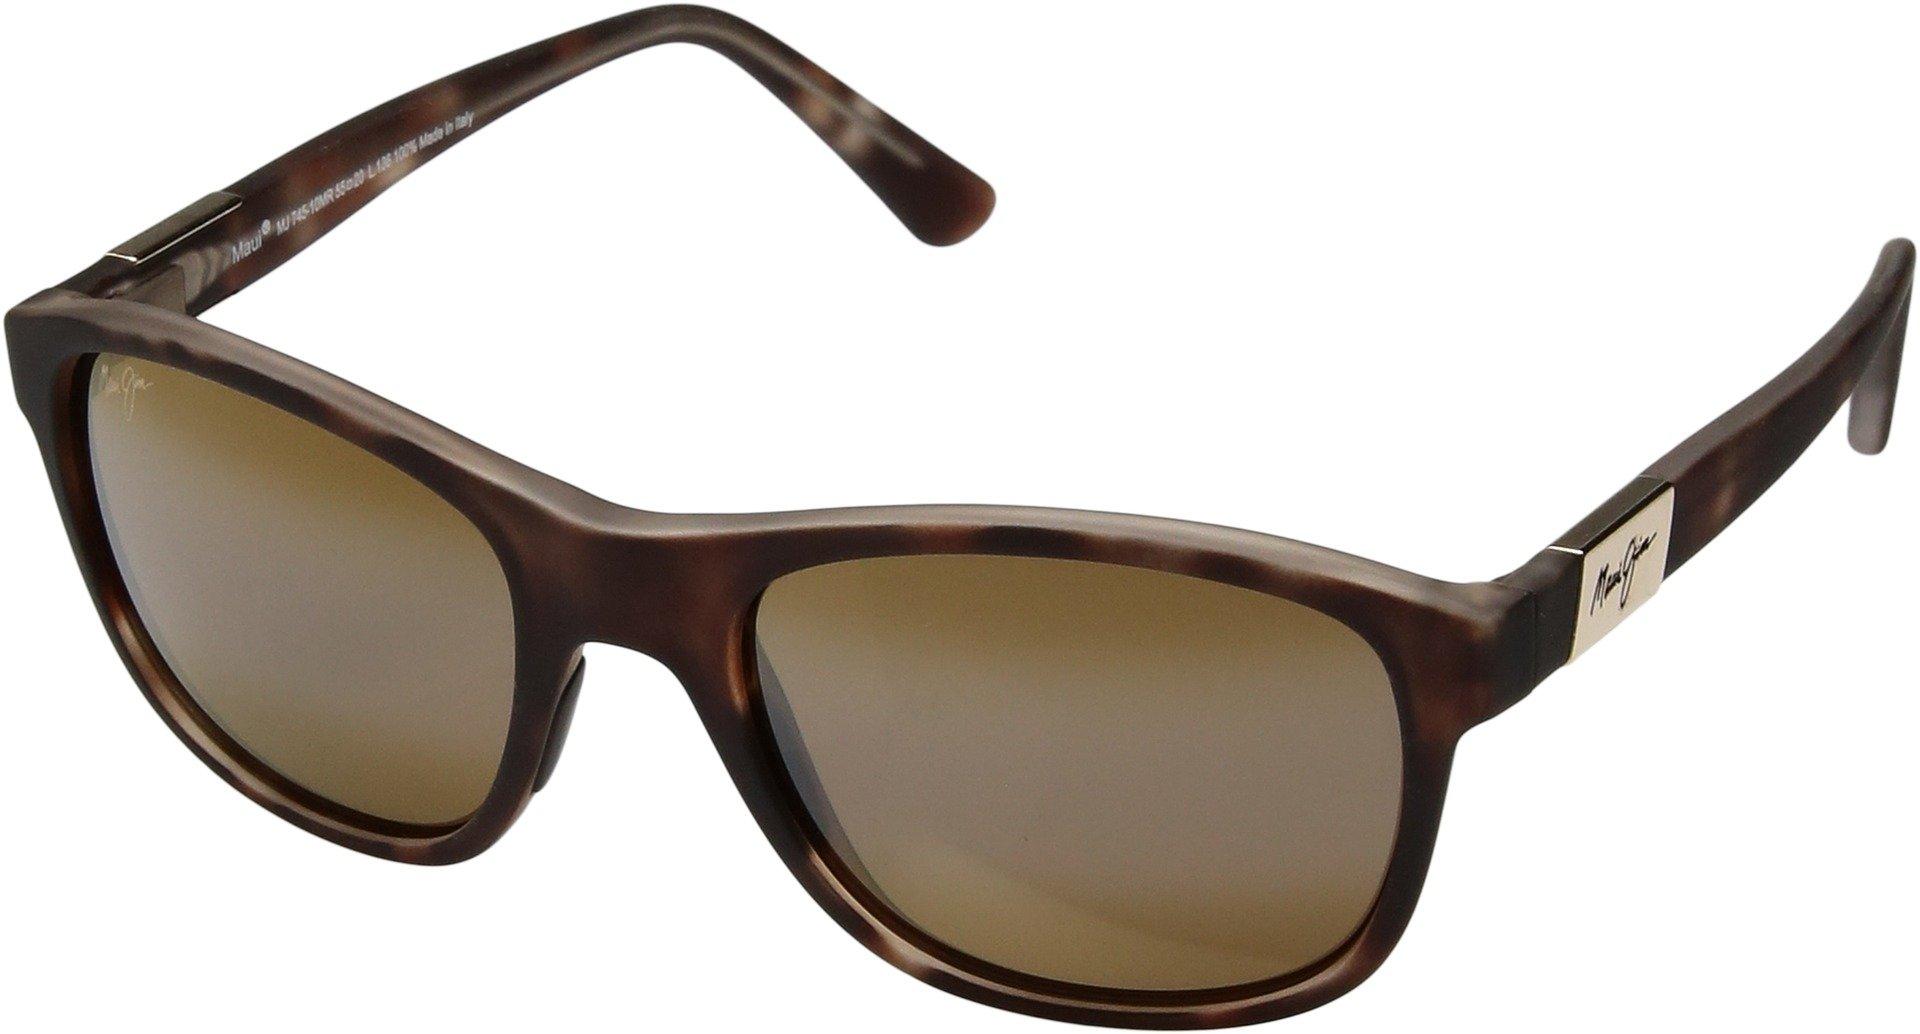 Maui Jim Unisex Wakea Matte Tortoise Rubber/Hcl Bronze Sunglasses